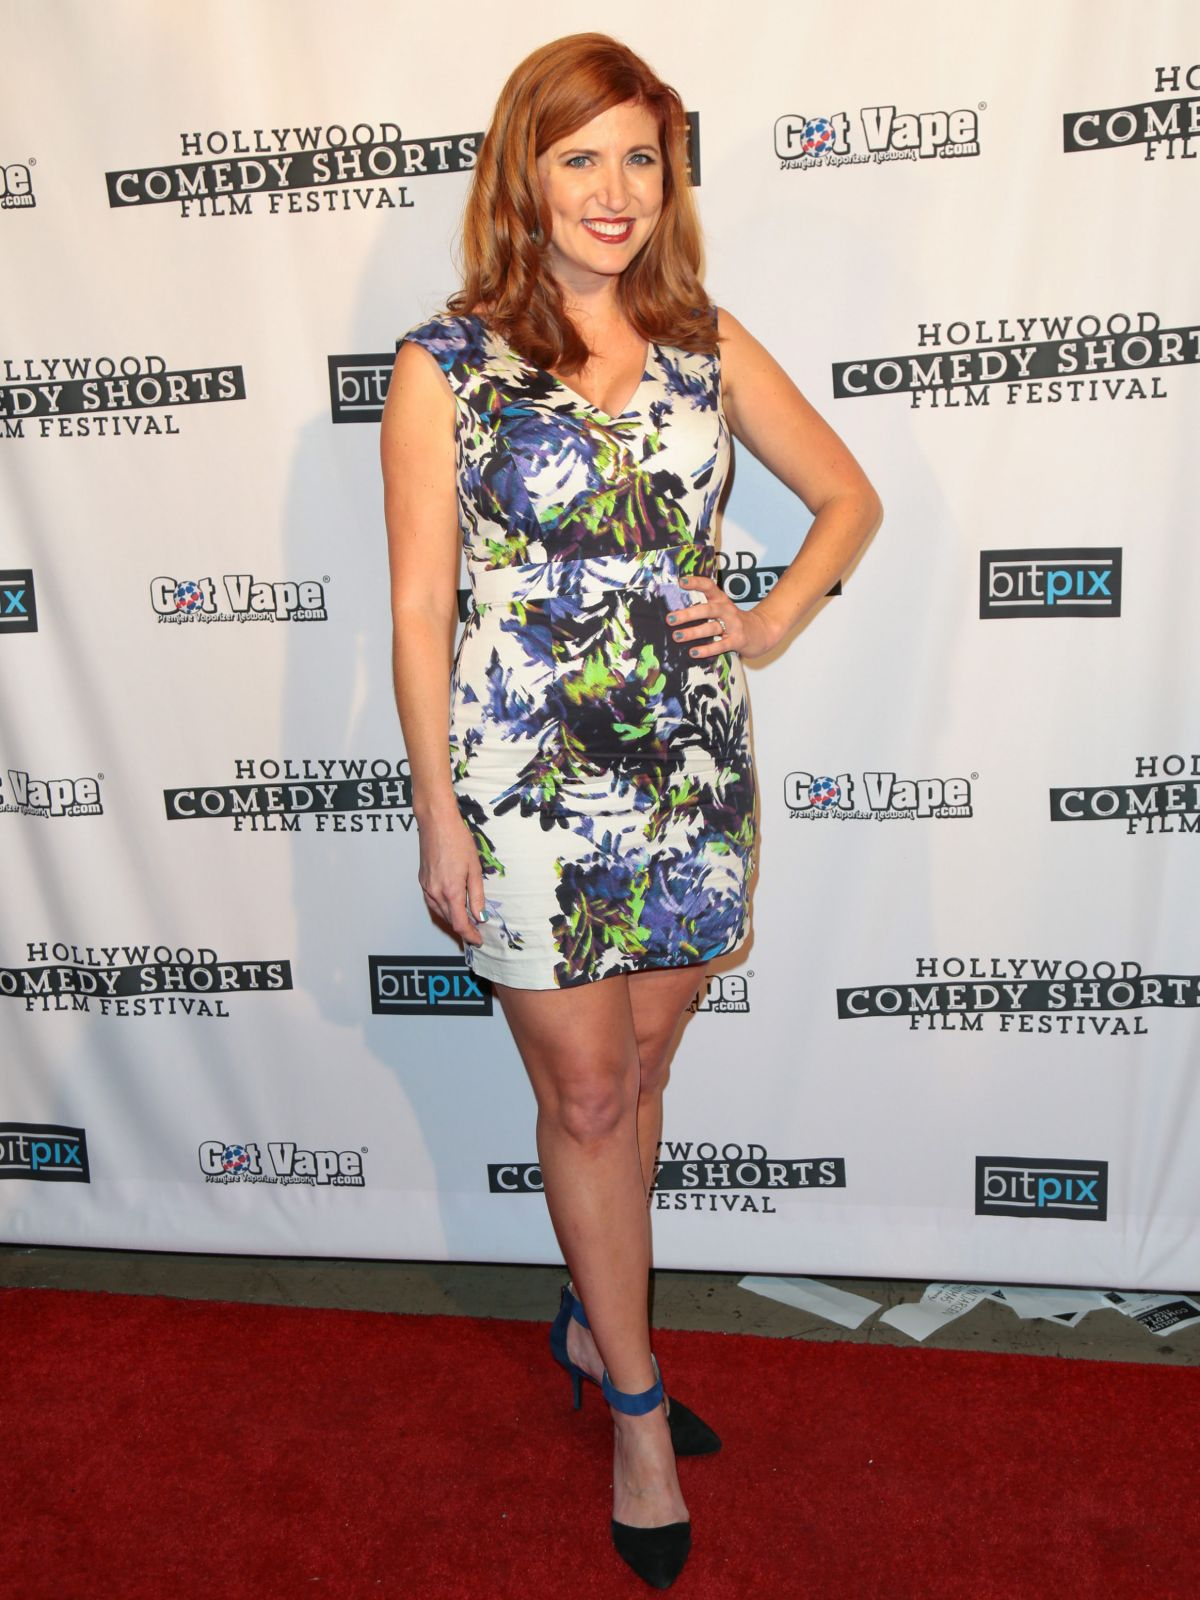 JESSICA GARDNER at Hollywood Comedy Shorts Film Festival 04/15/2017